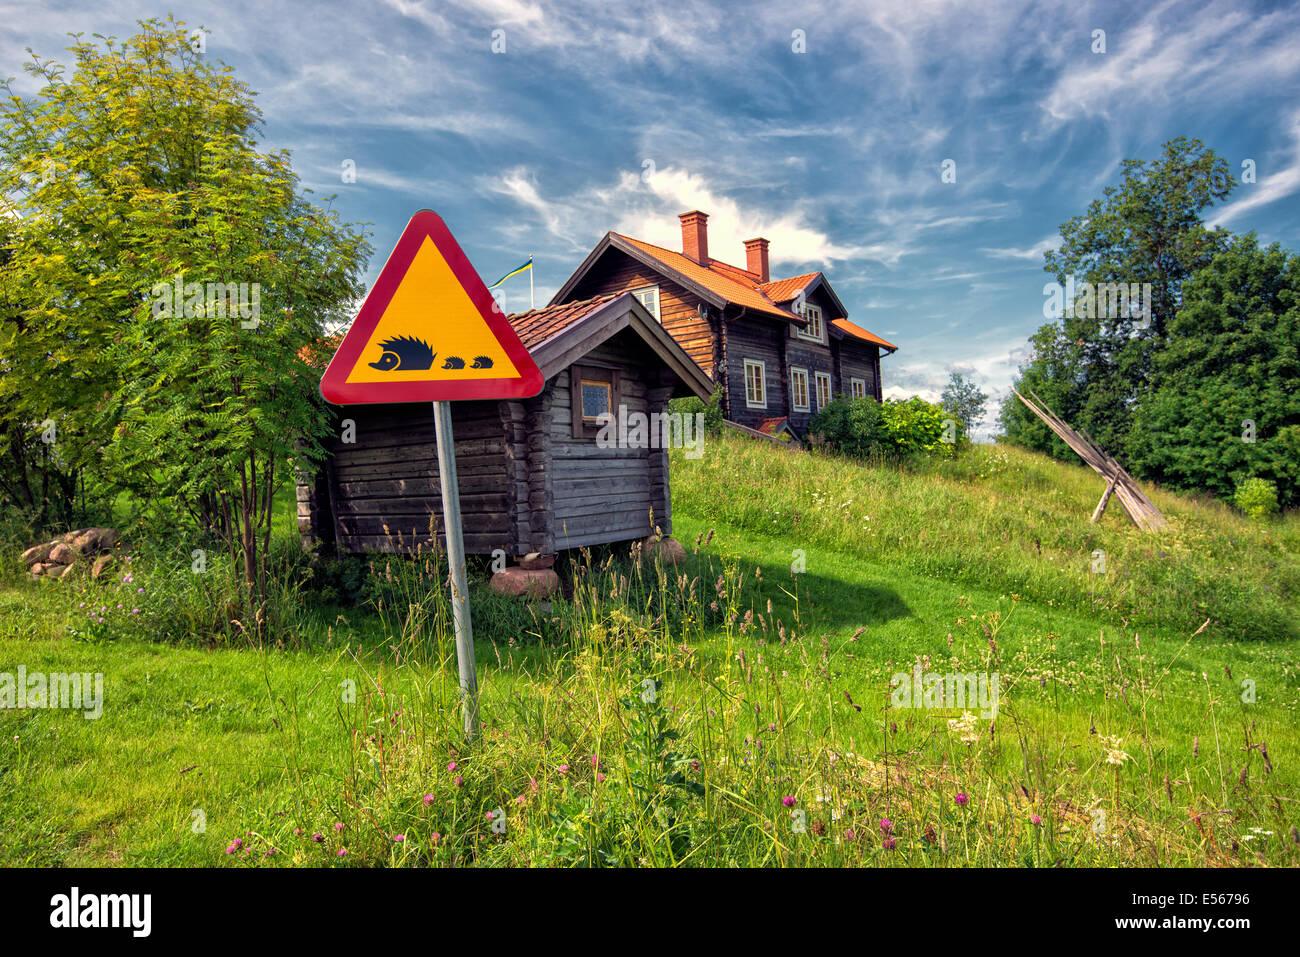 Traffic sign warning for hedgehogs crossing in idyllic Dalecarlia, Sweden Stock Photo